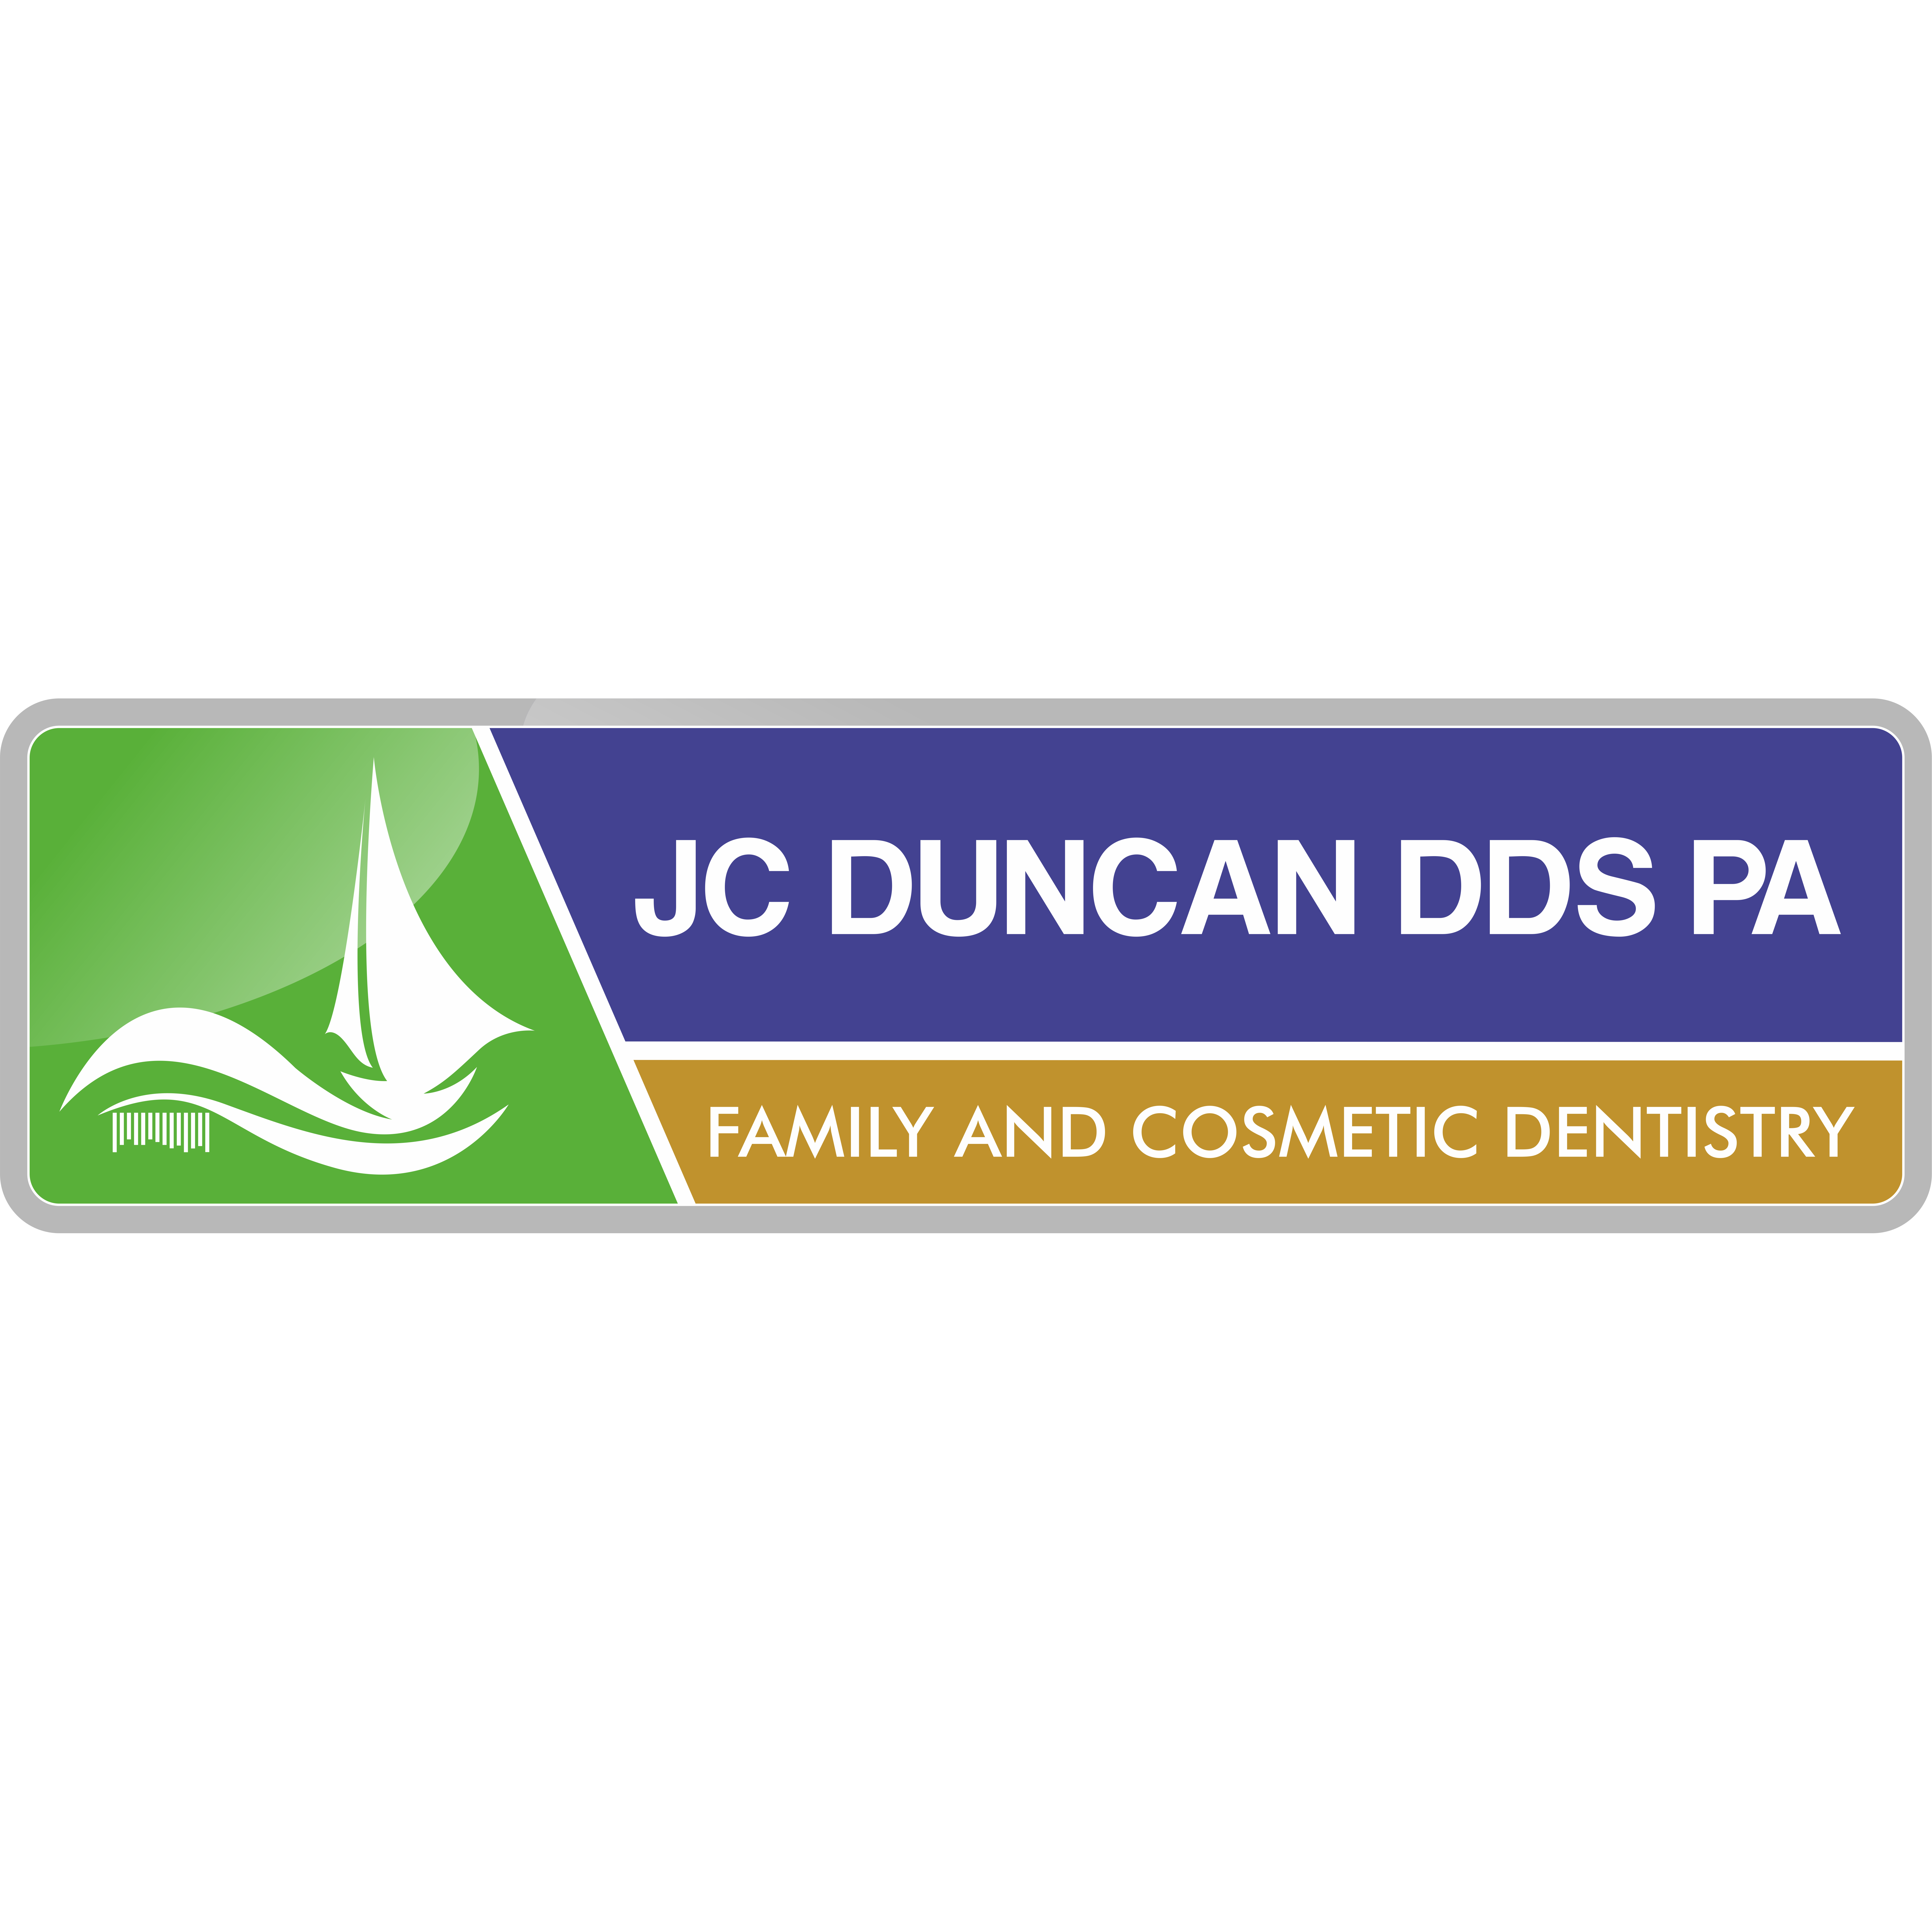 JC Duncan DDS PA